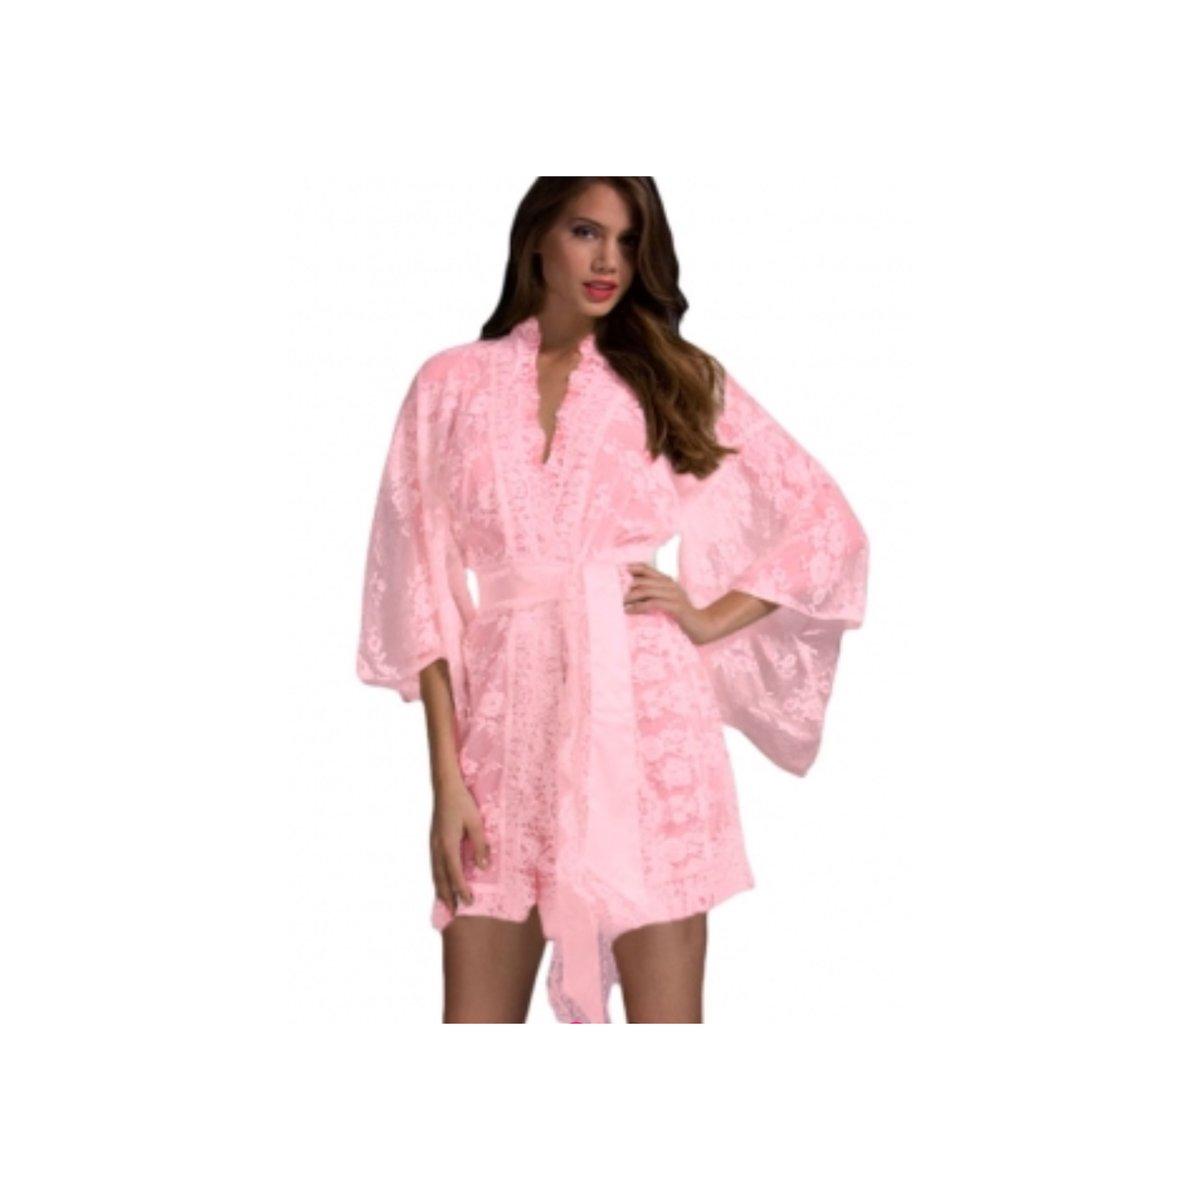 Image of Barbie Pink Lace Kimono